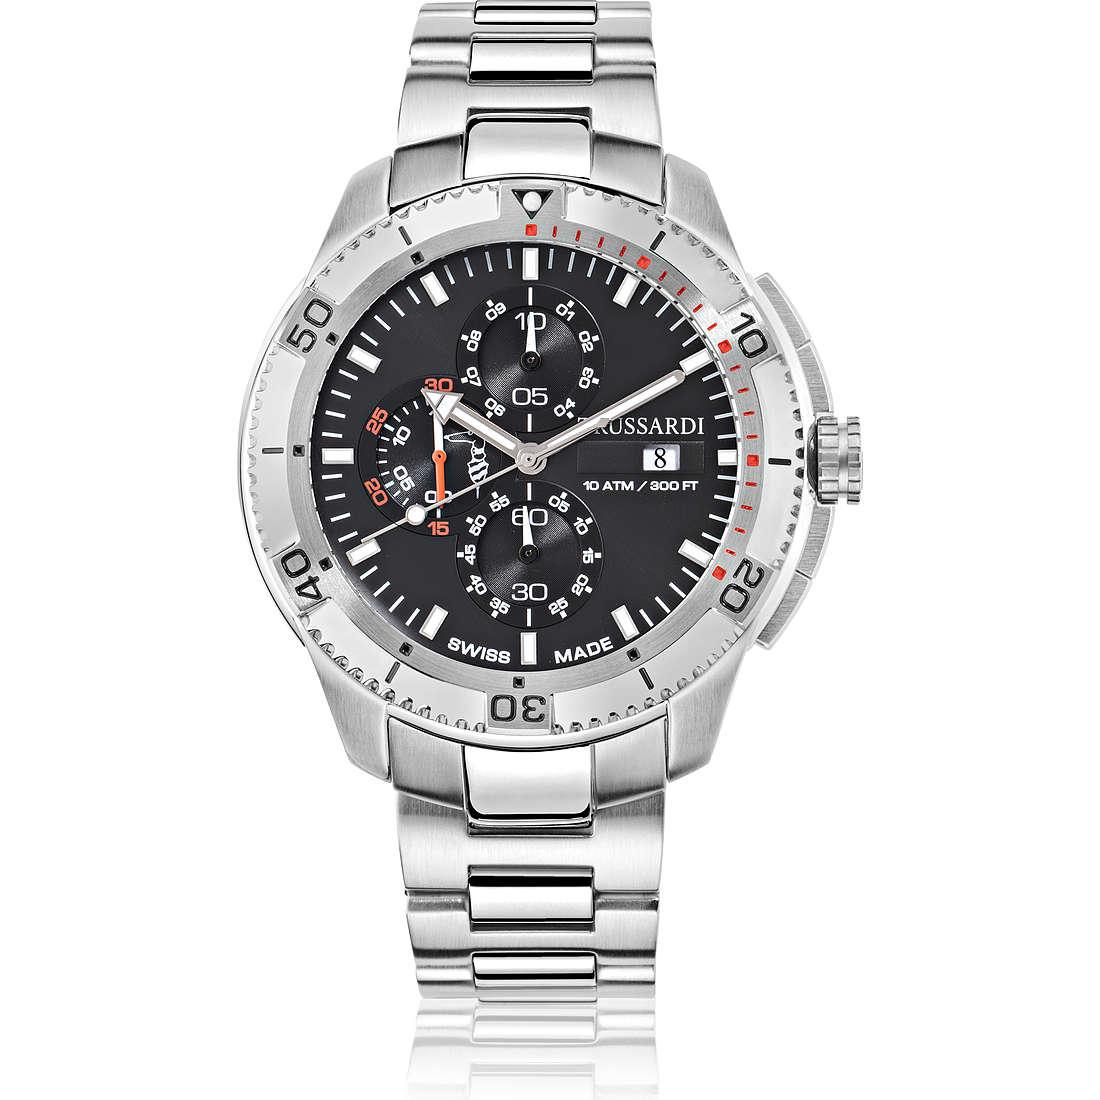 orologio cronografo uomo Trussardi Sportsman R2473601001